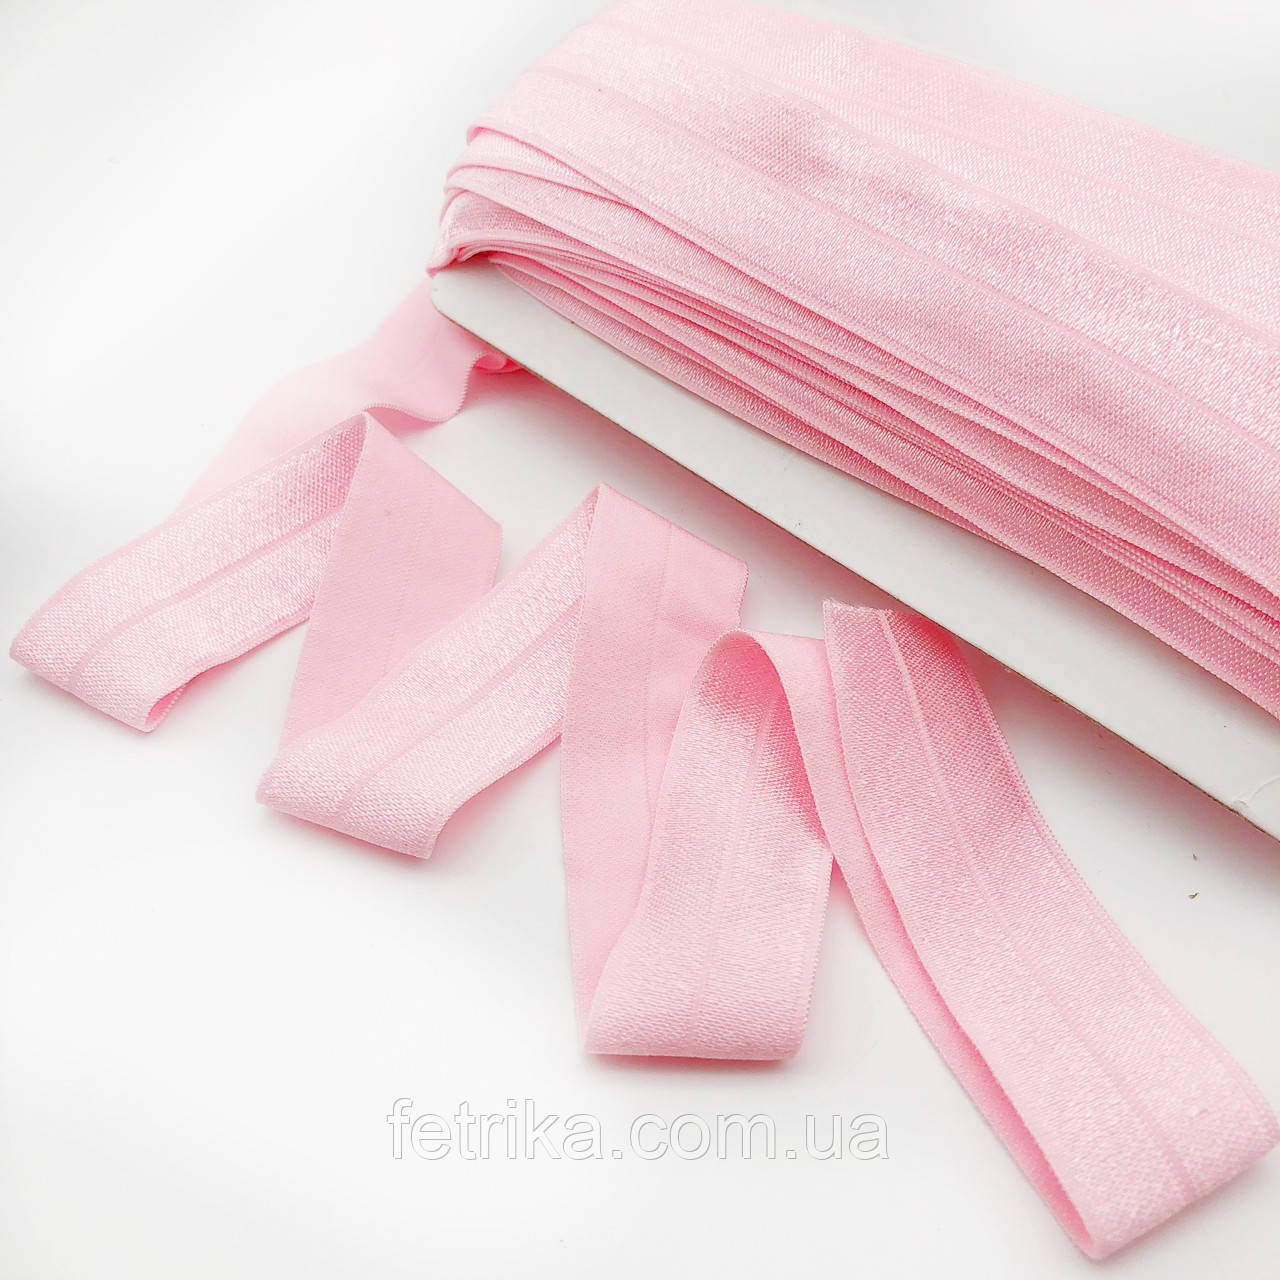 Лента стрейчевая (Резинка для повязок) розовая 2,5 см